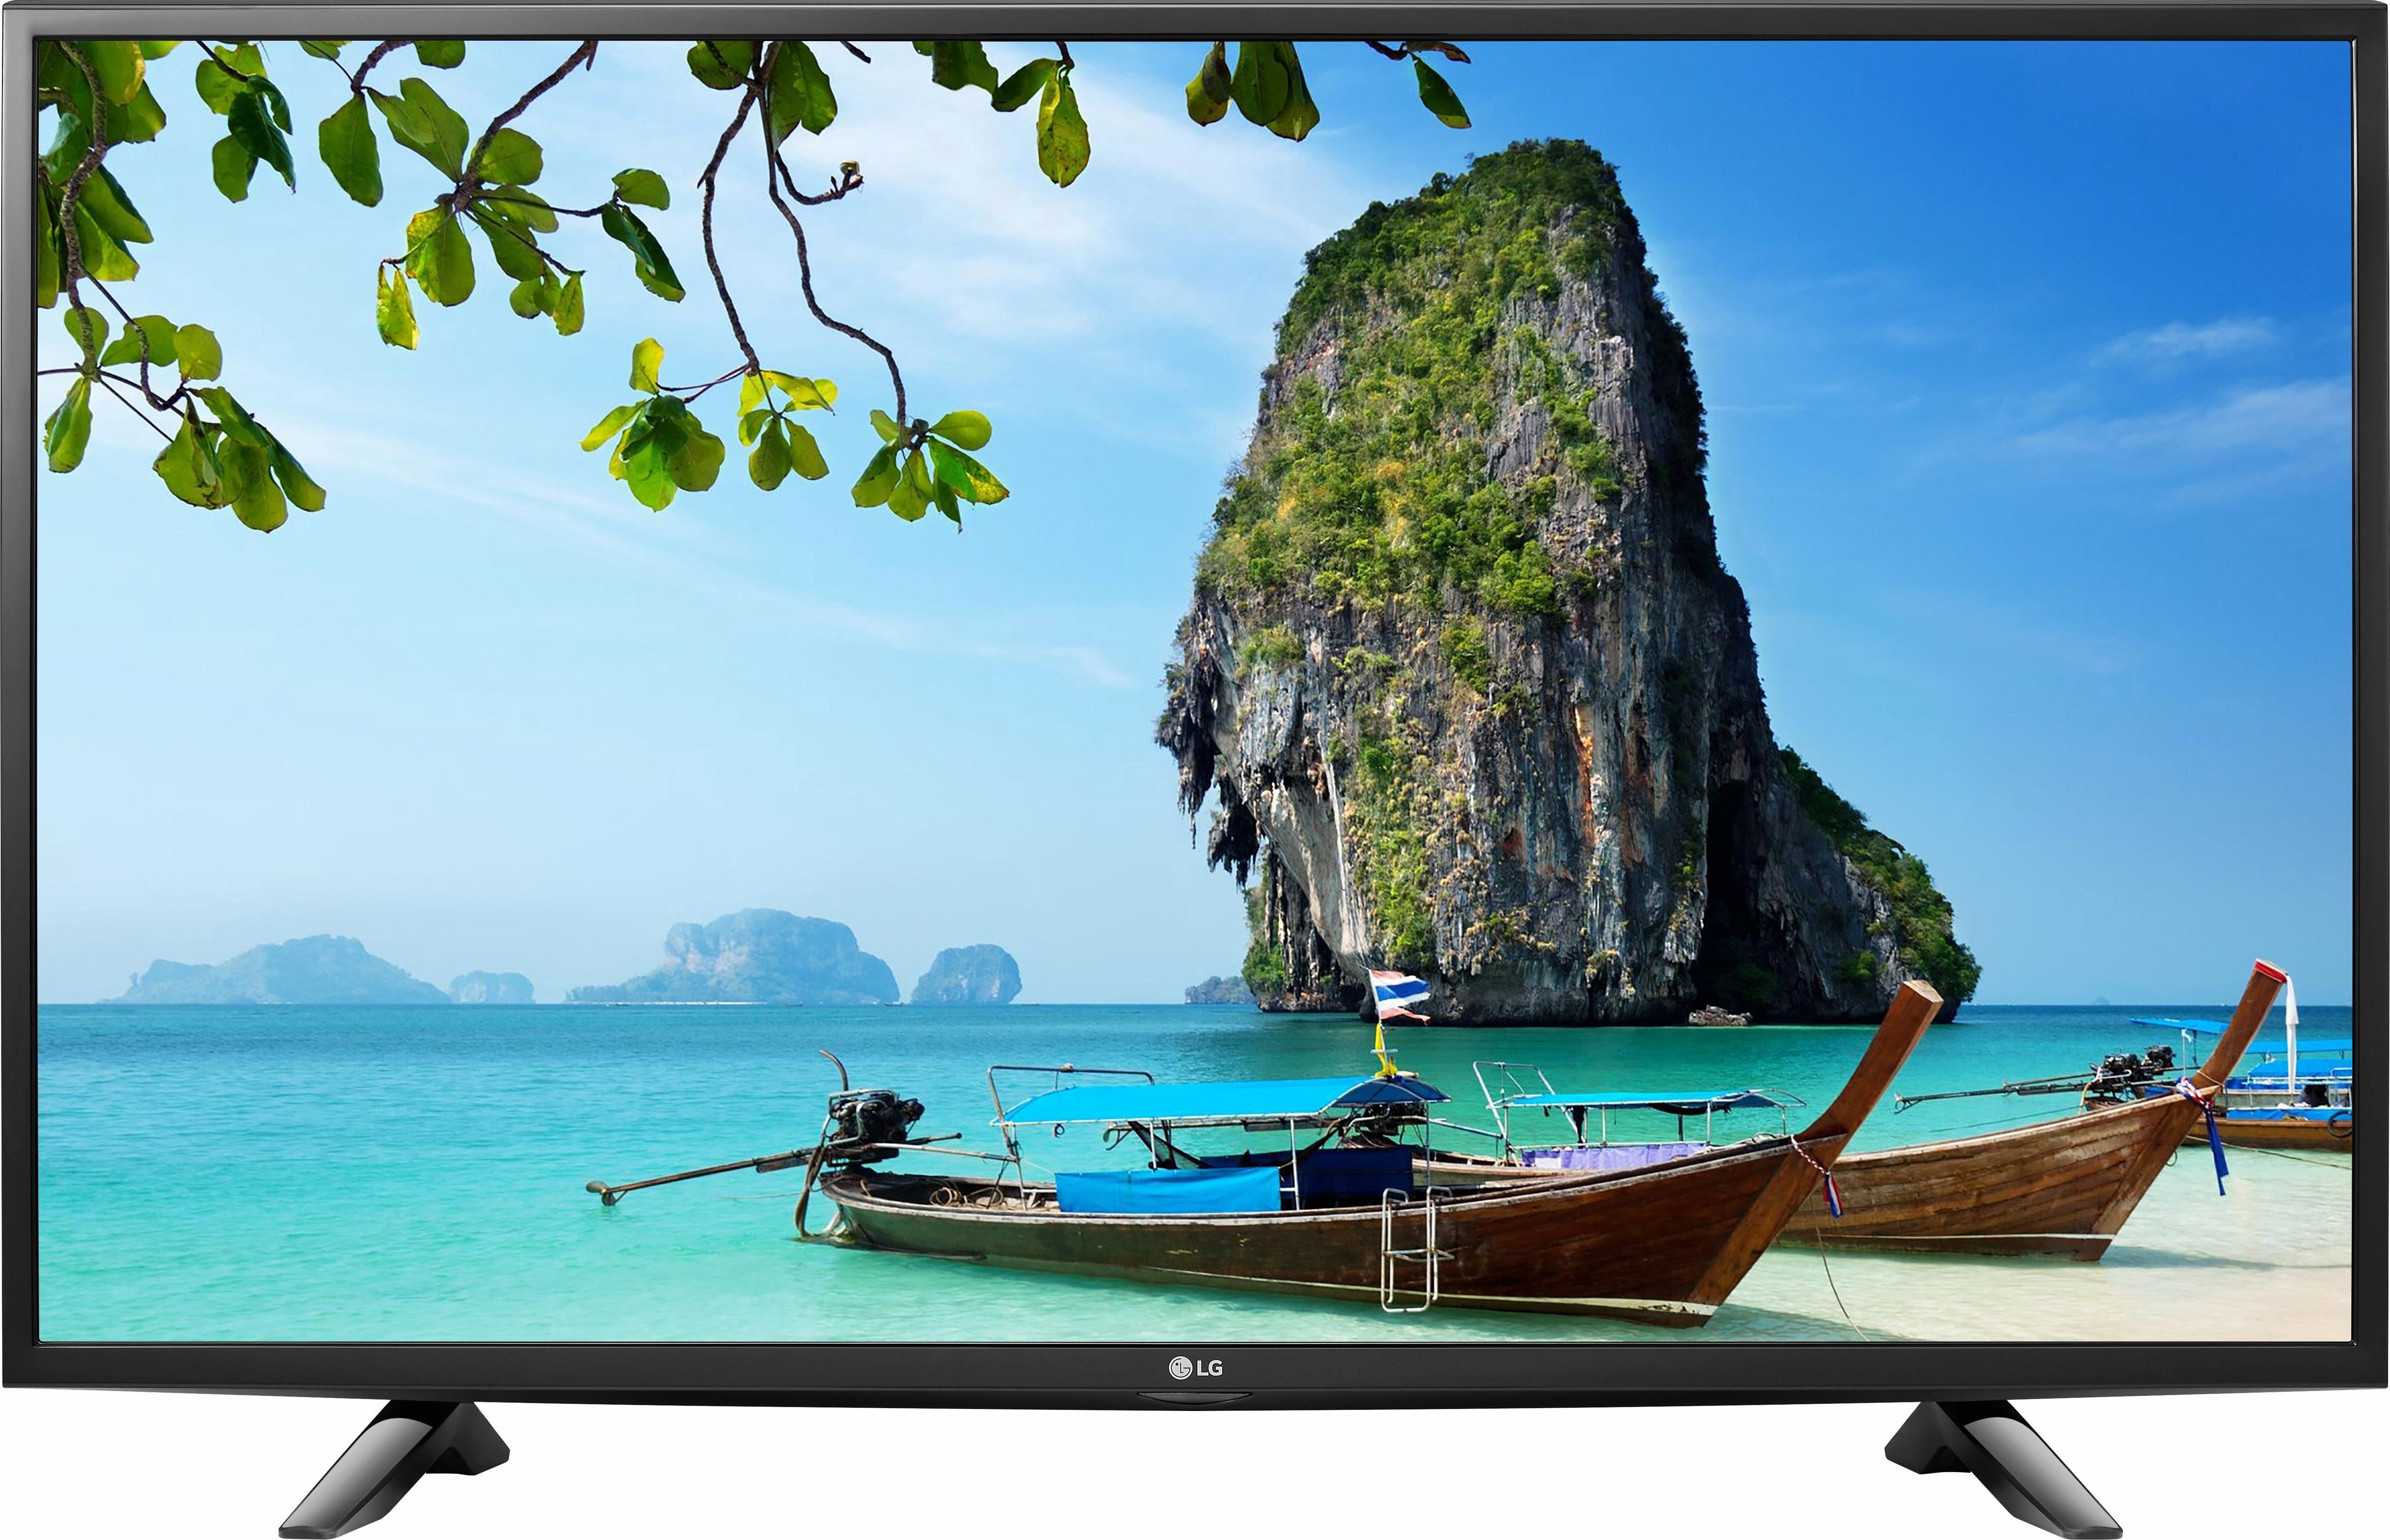 LG 43LH510V, LED Fernseher, 108 cm (43 Zoll), 1080p (Full HD)